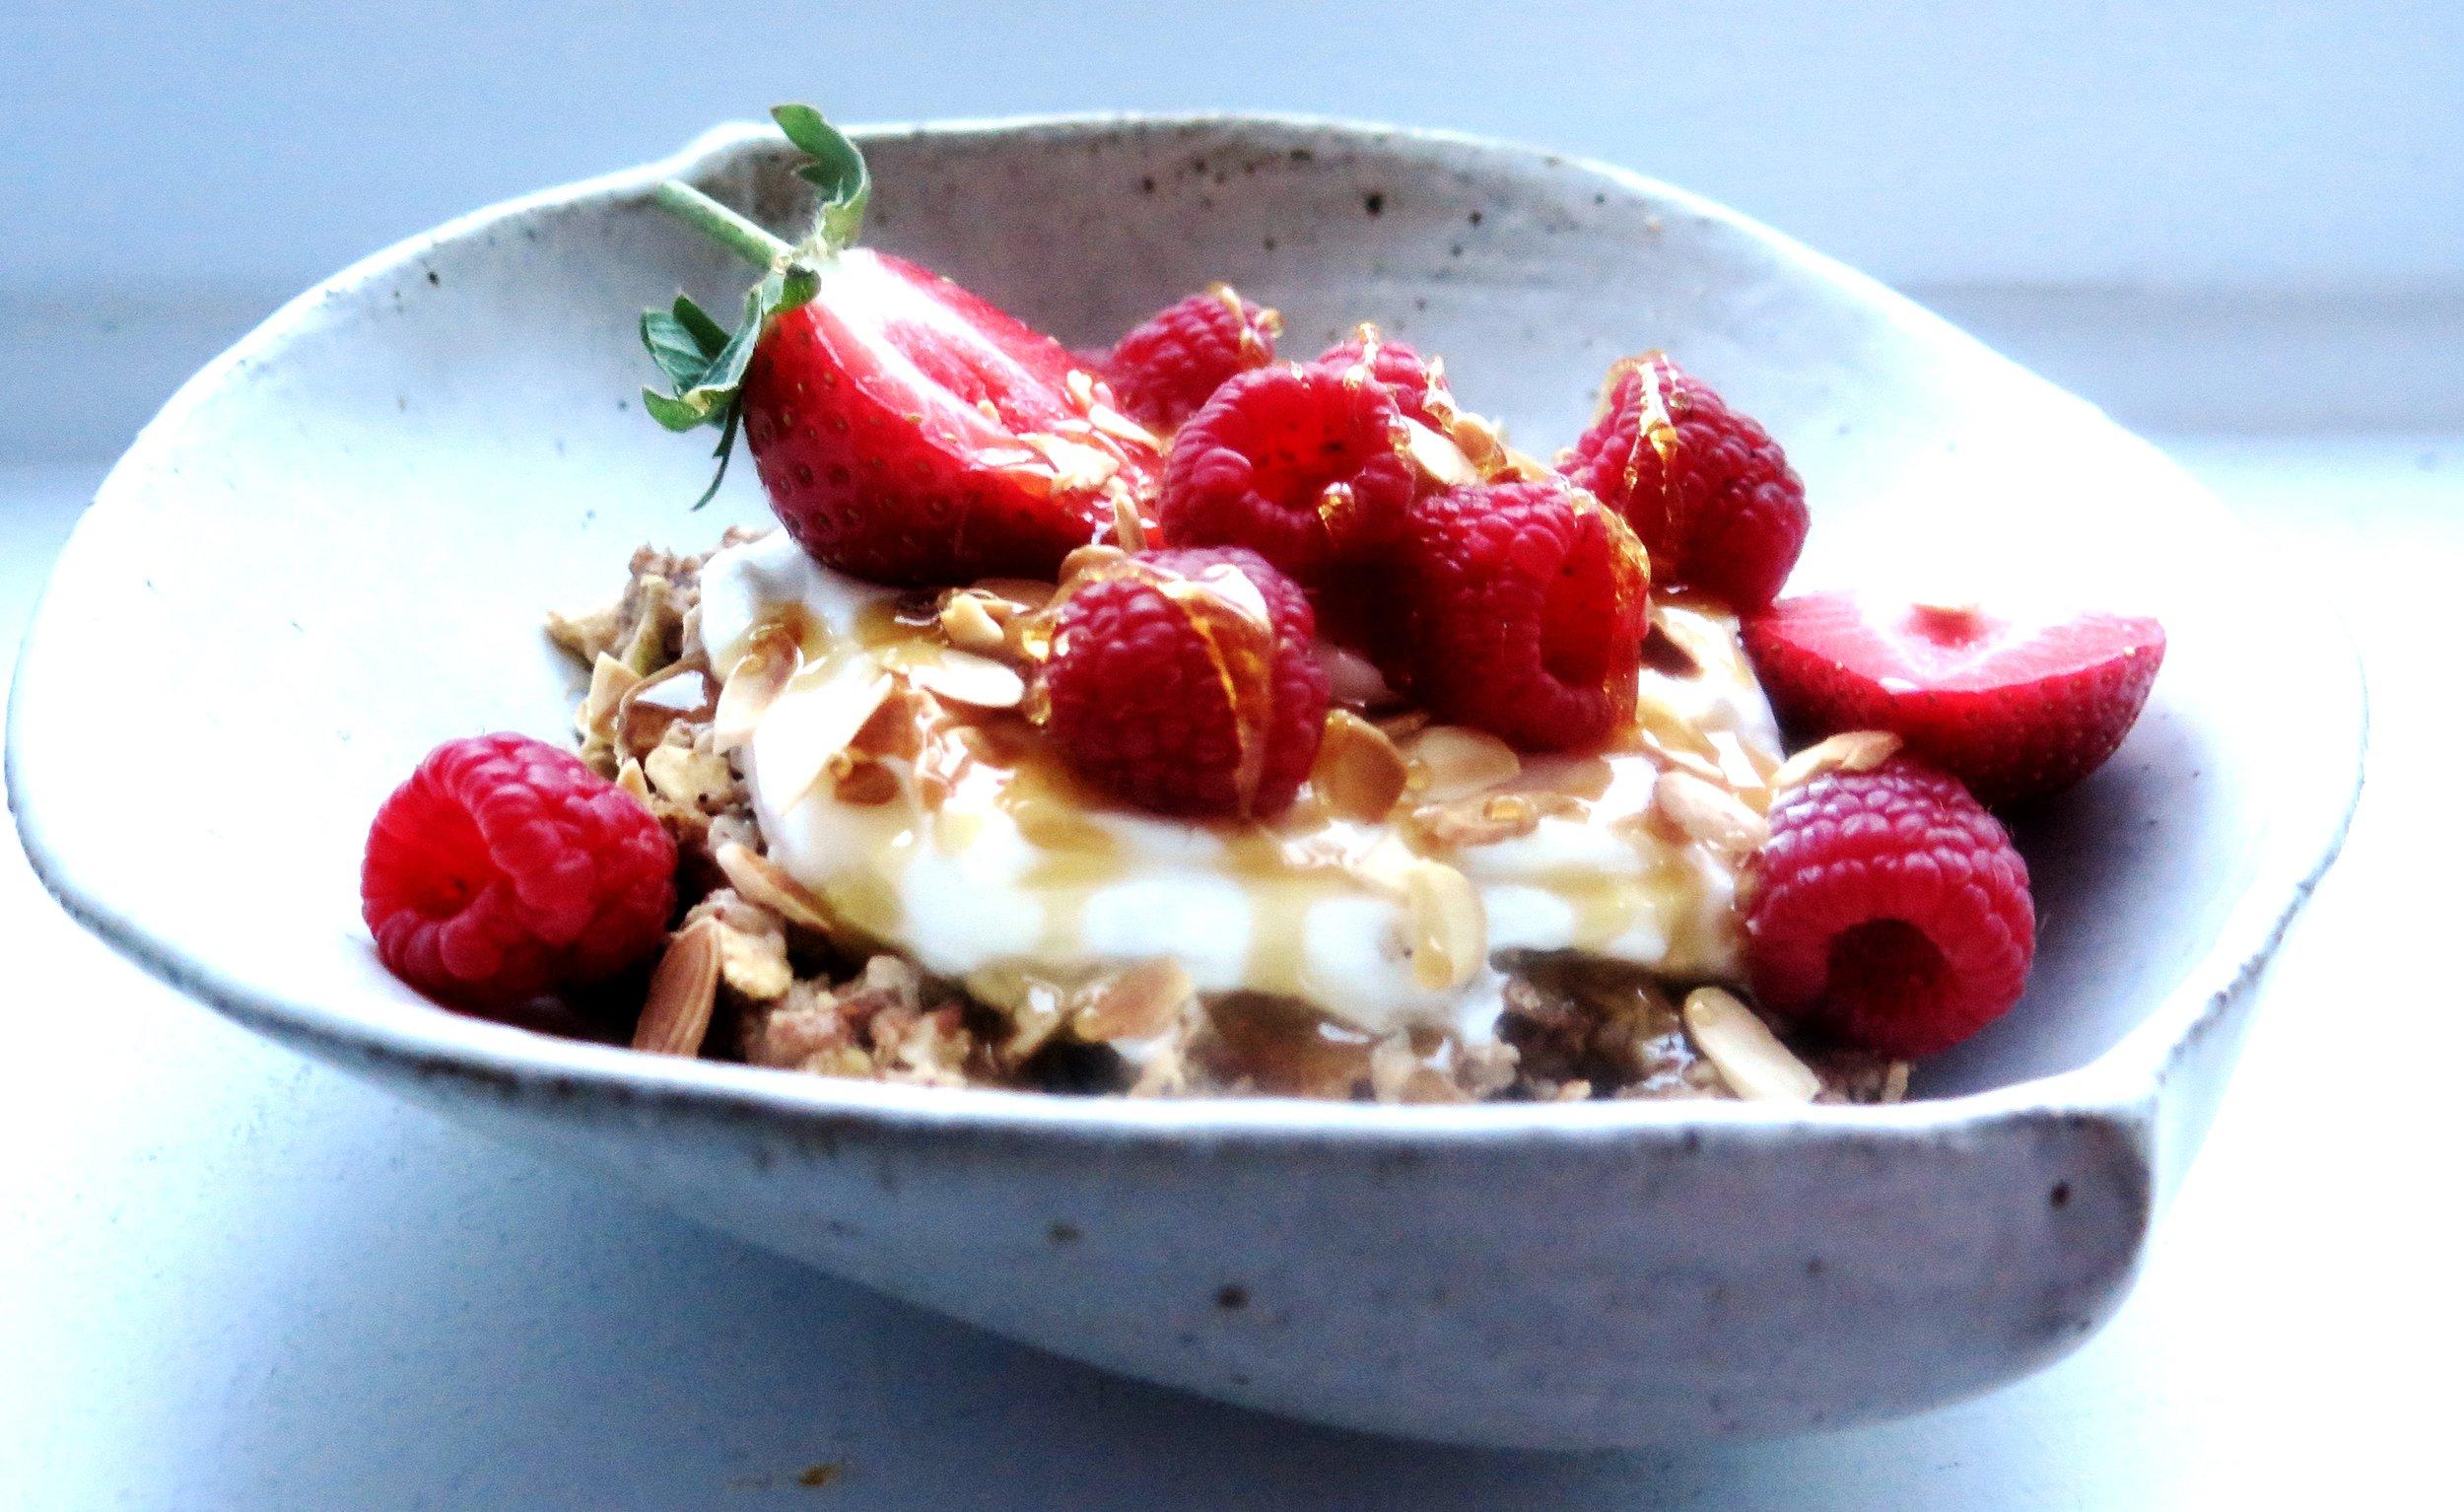 Vanilla Bean & Cinnamon Bircher Muesli (Dairy-free, Sugar-free, Gluten-free) - Recipe